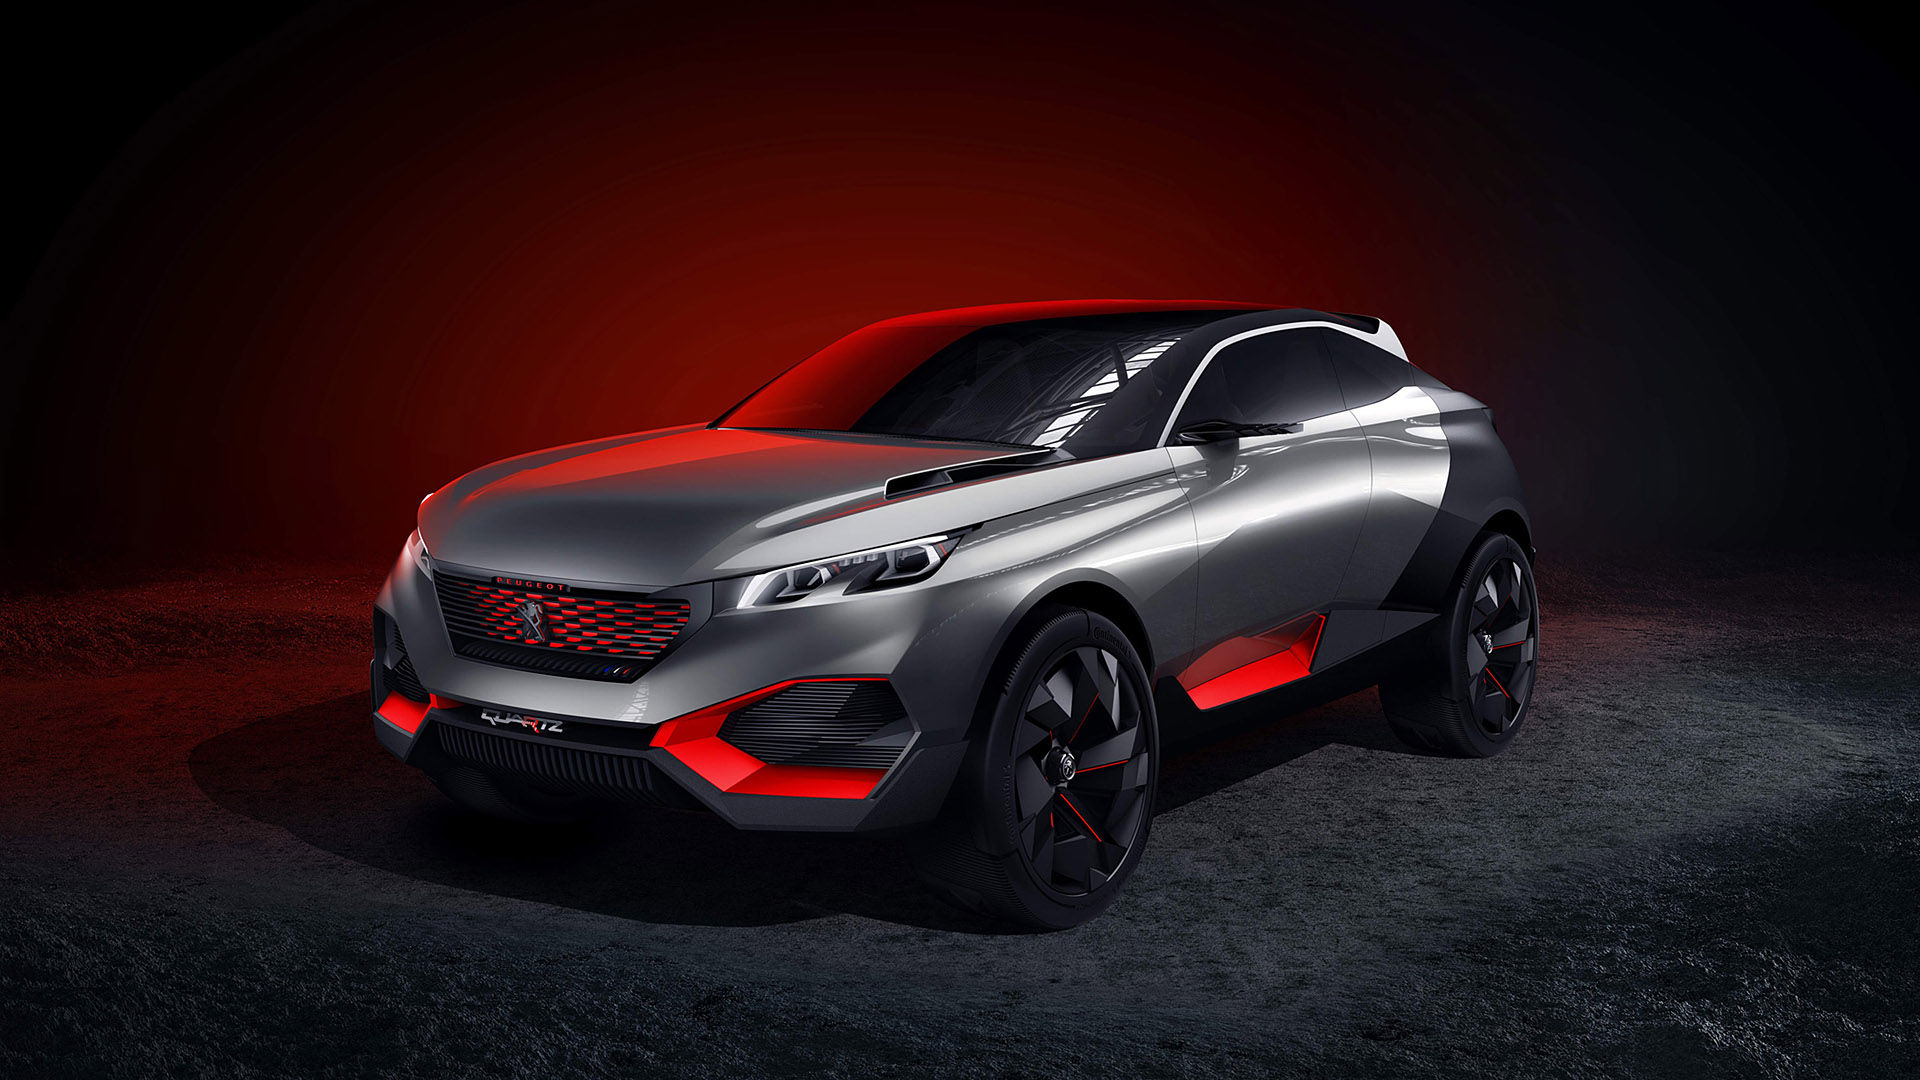 2014 Peugeot Quartz Concept